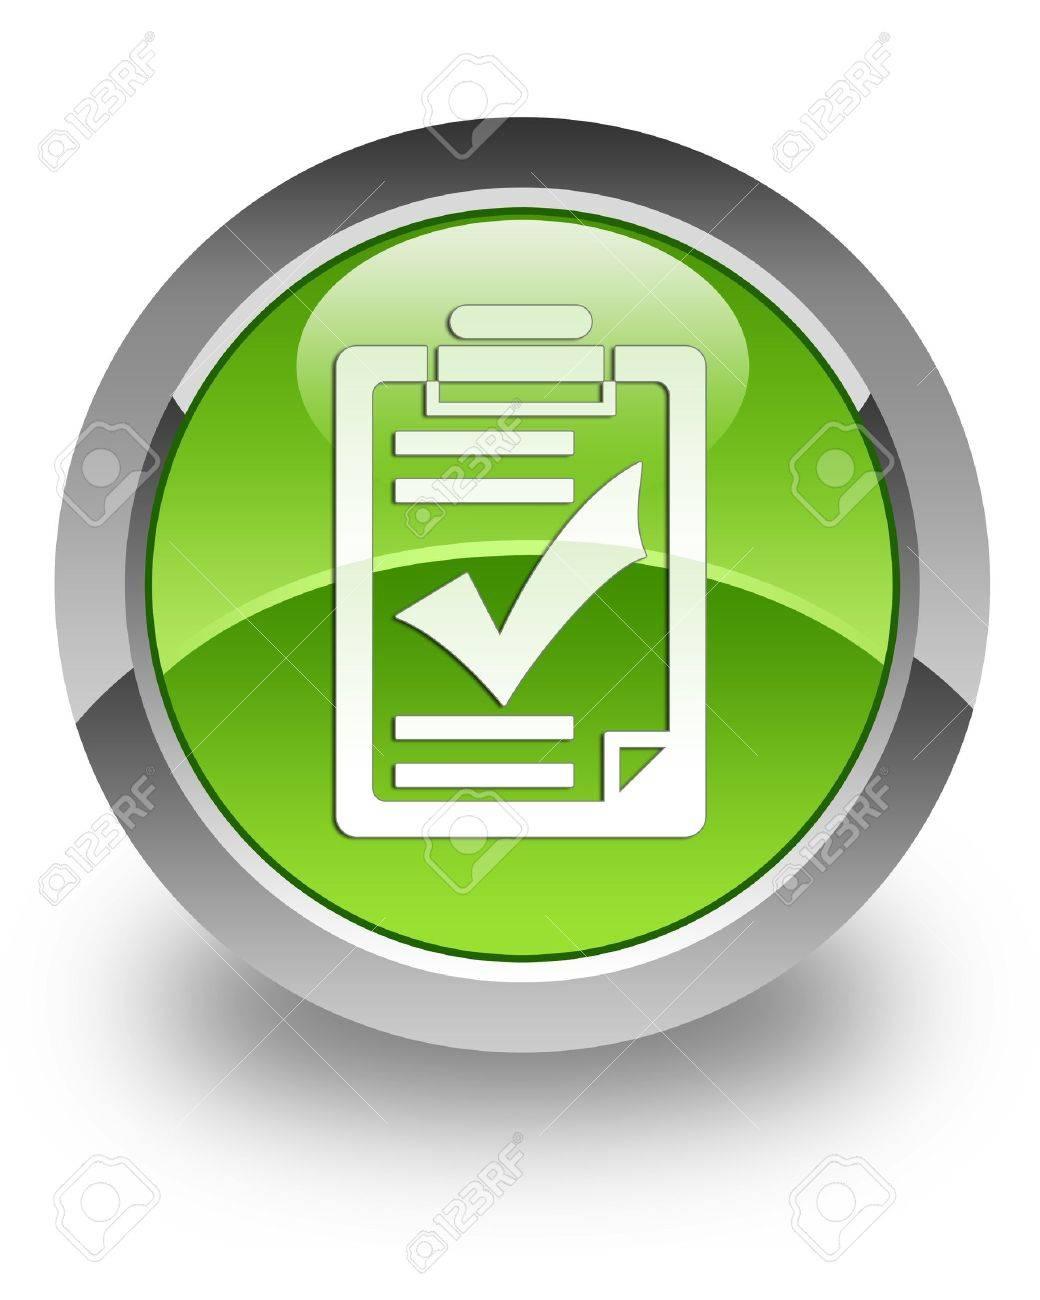 Checklist icon on green glossy button - 13261477